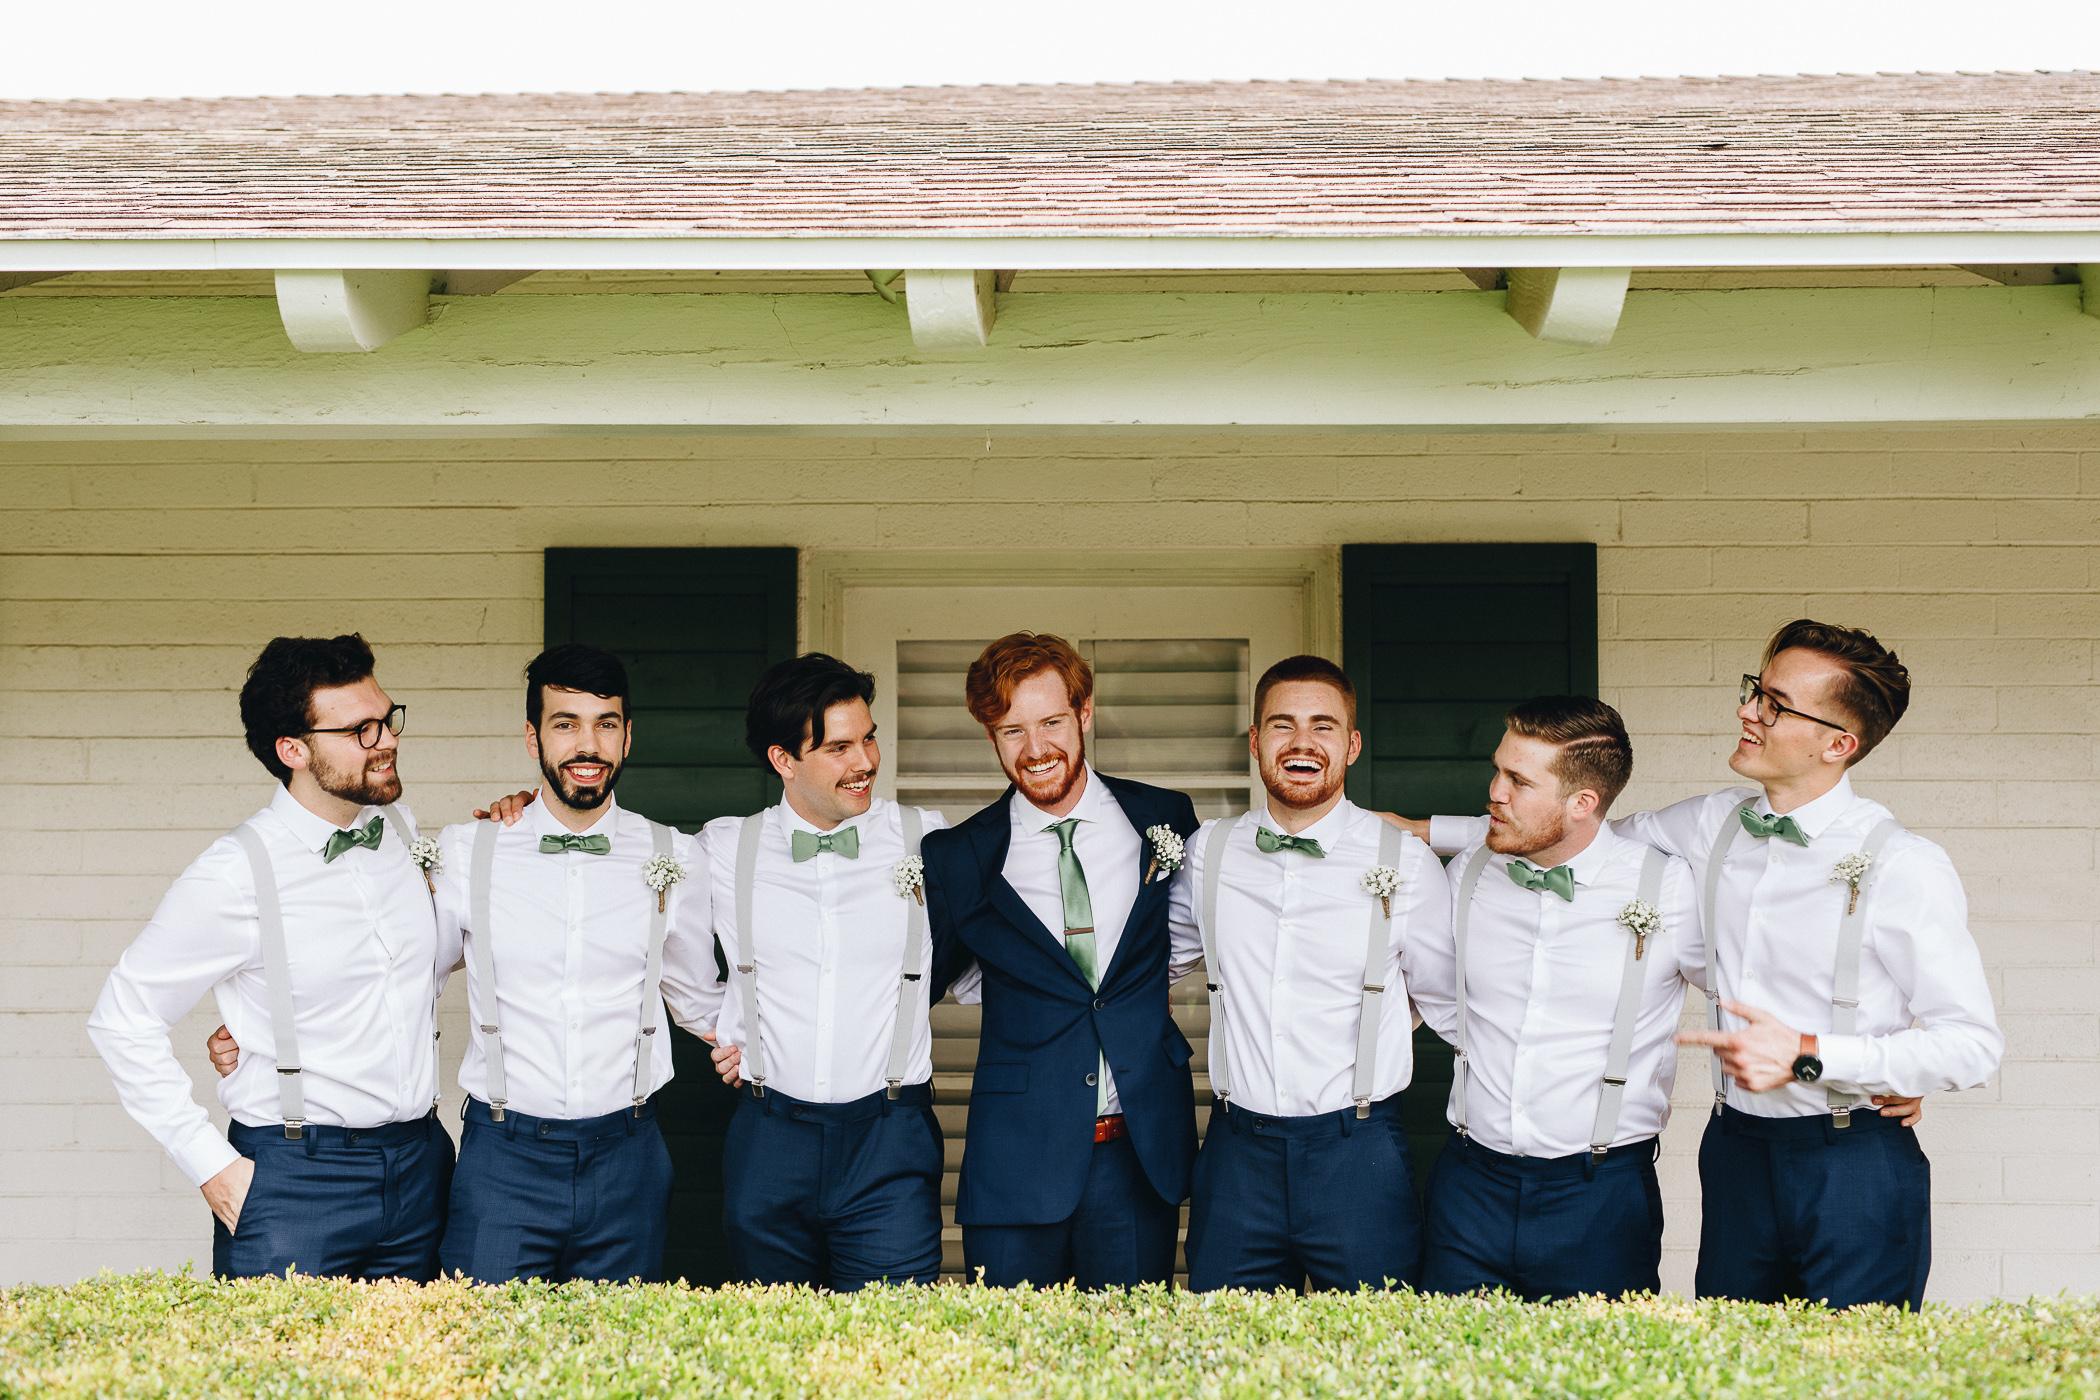 181104-Luxium-Weddings-Arizona-@matt__Le-Brandon-Kariana-Phoenix-Valley-Garden-Center-1034.jpg